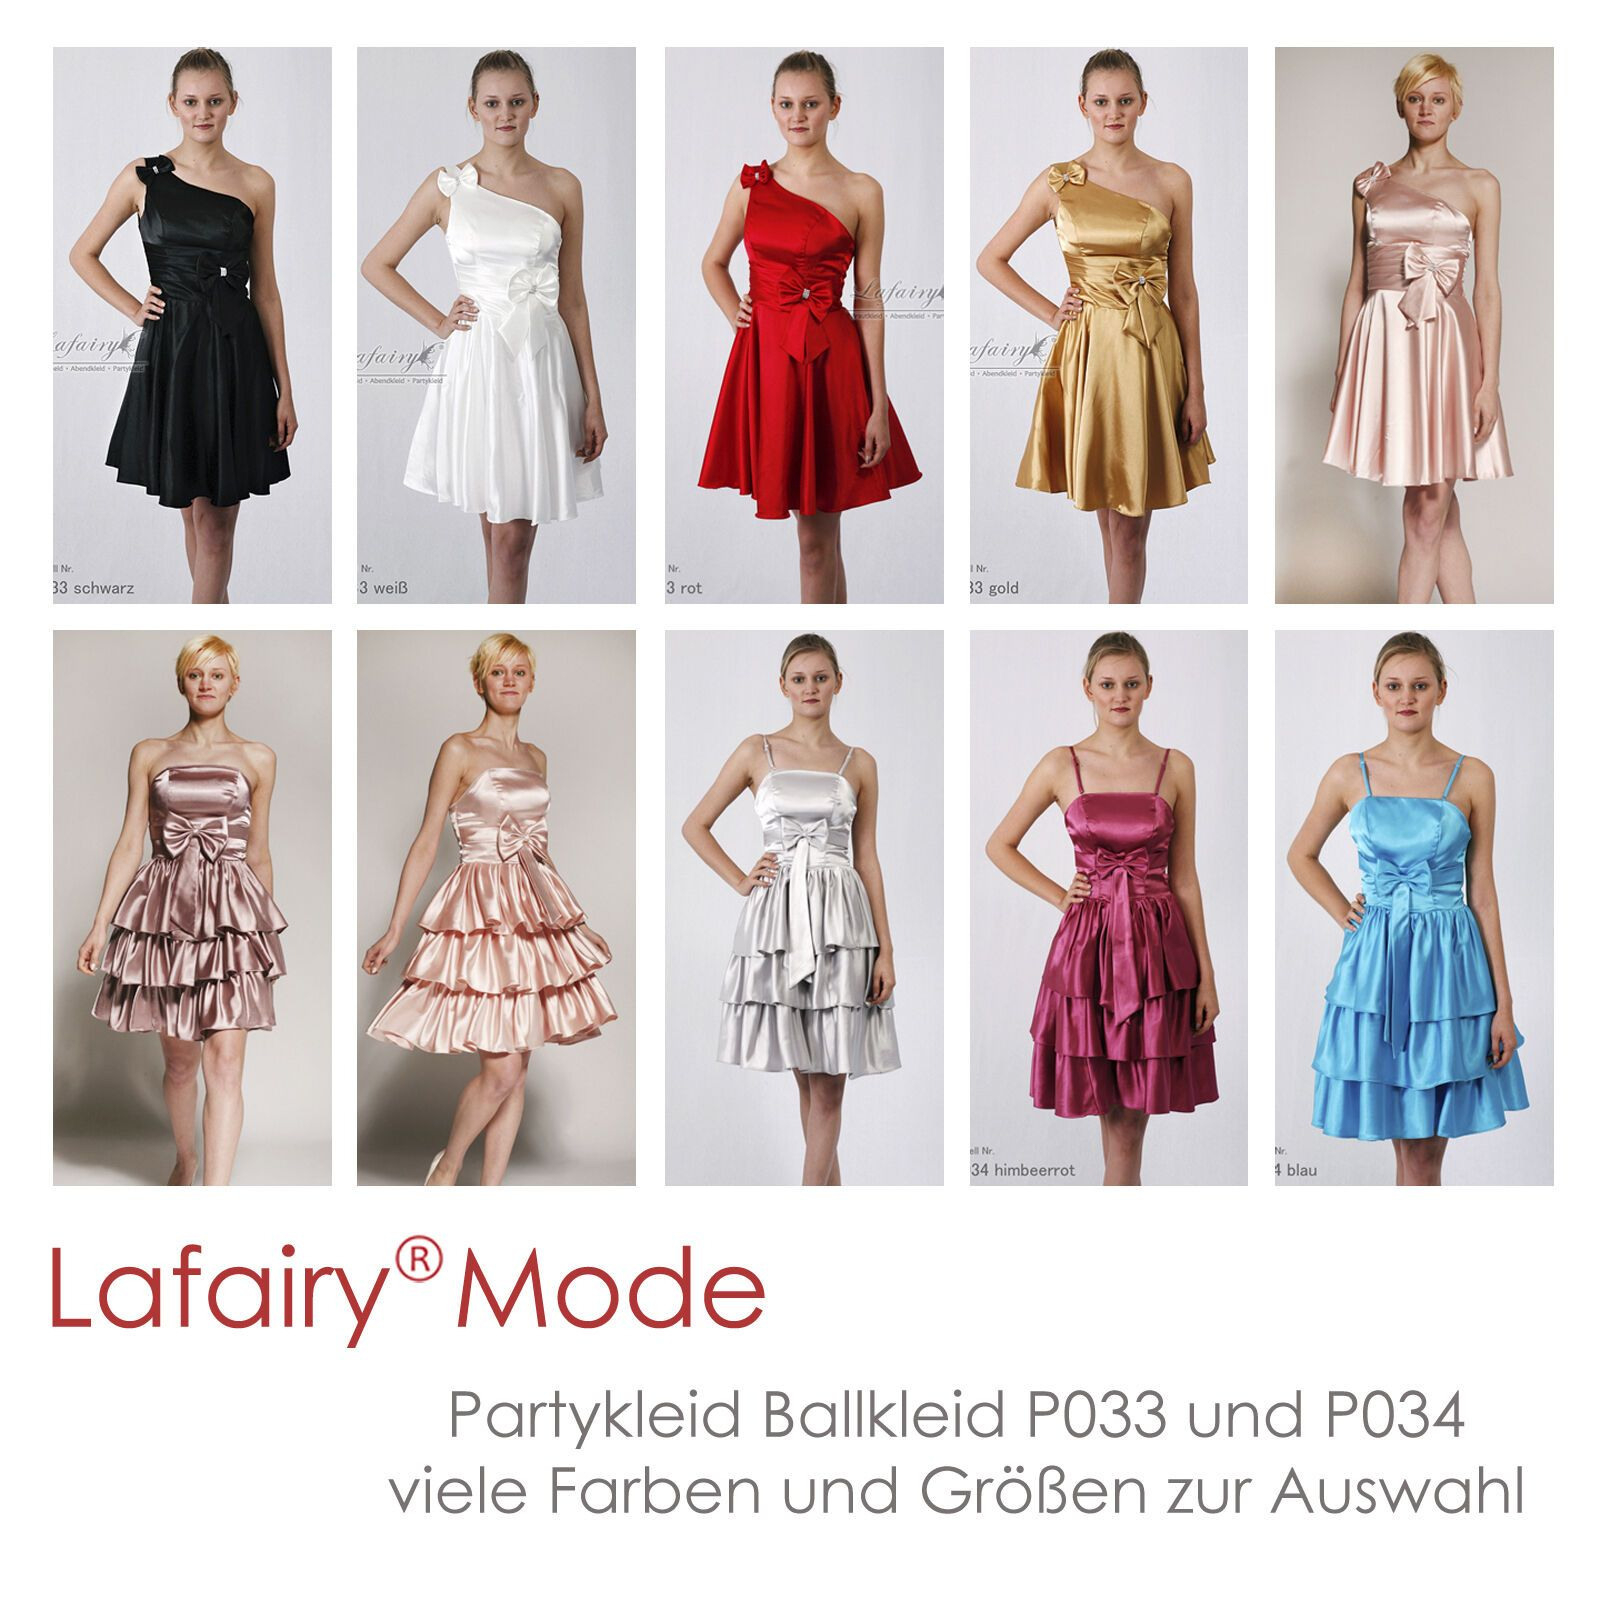 Leicht Abendkleid Fair DesignDesigner Großartig Abendkleid Fair Stylish